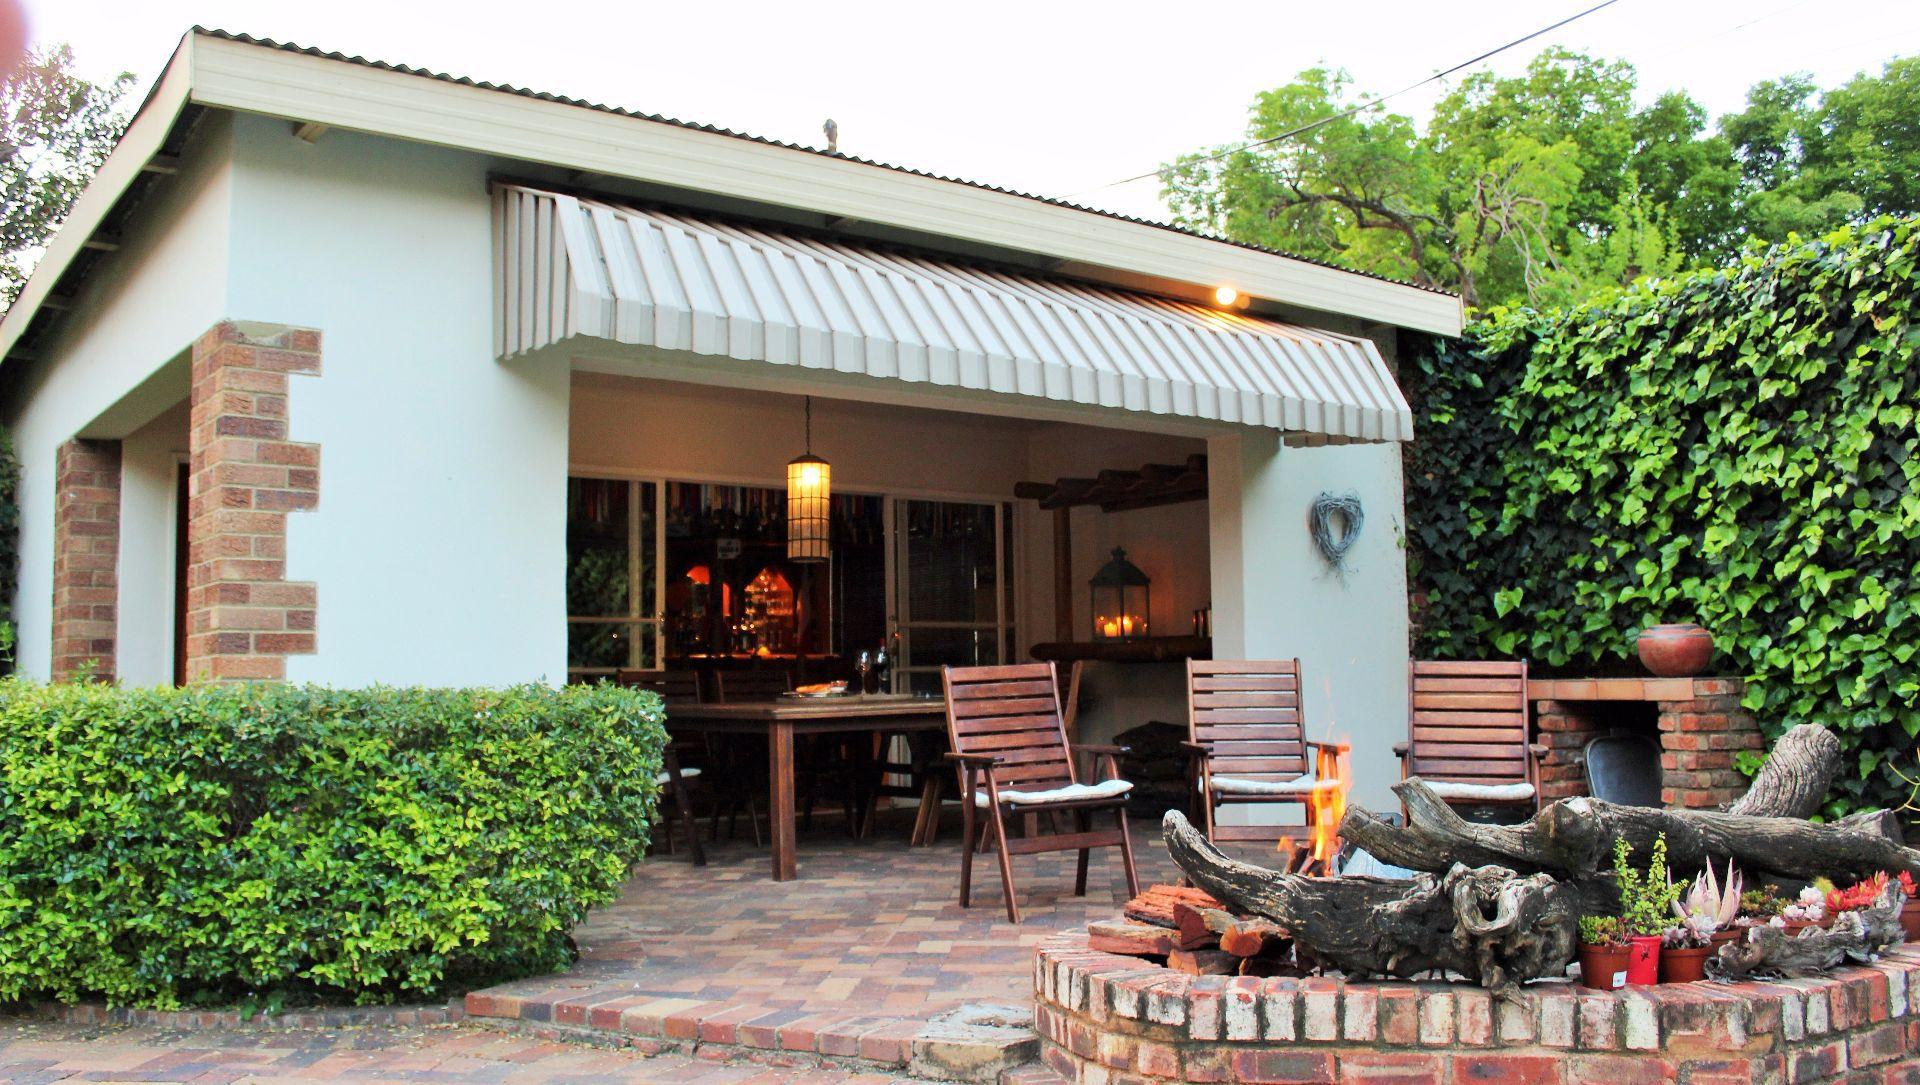 Heilige Akker property for sale. Ref No: 13540532. Picture no 20